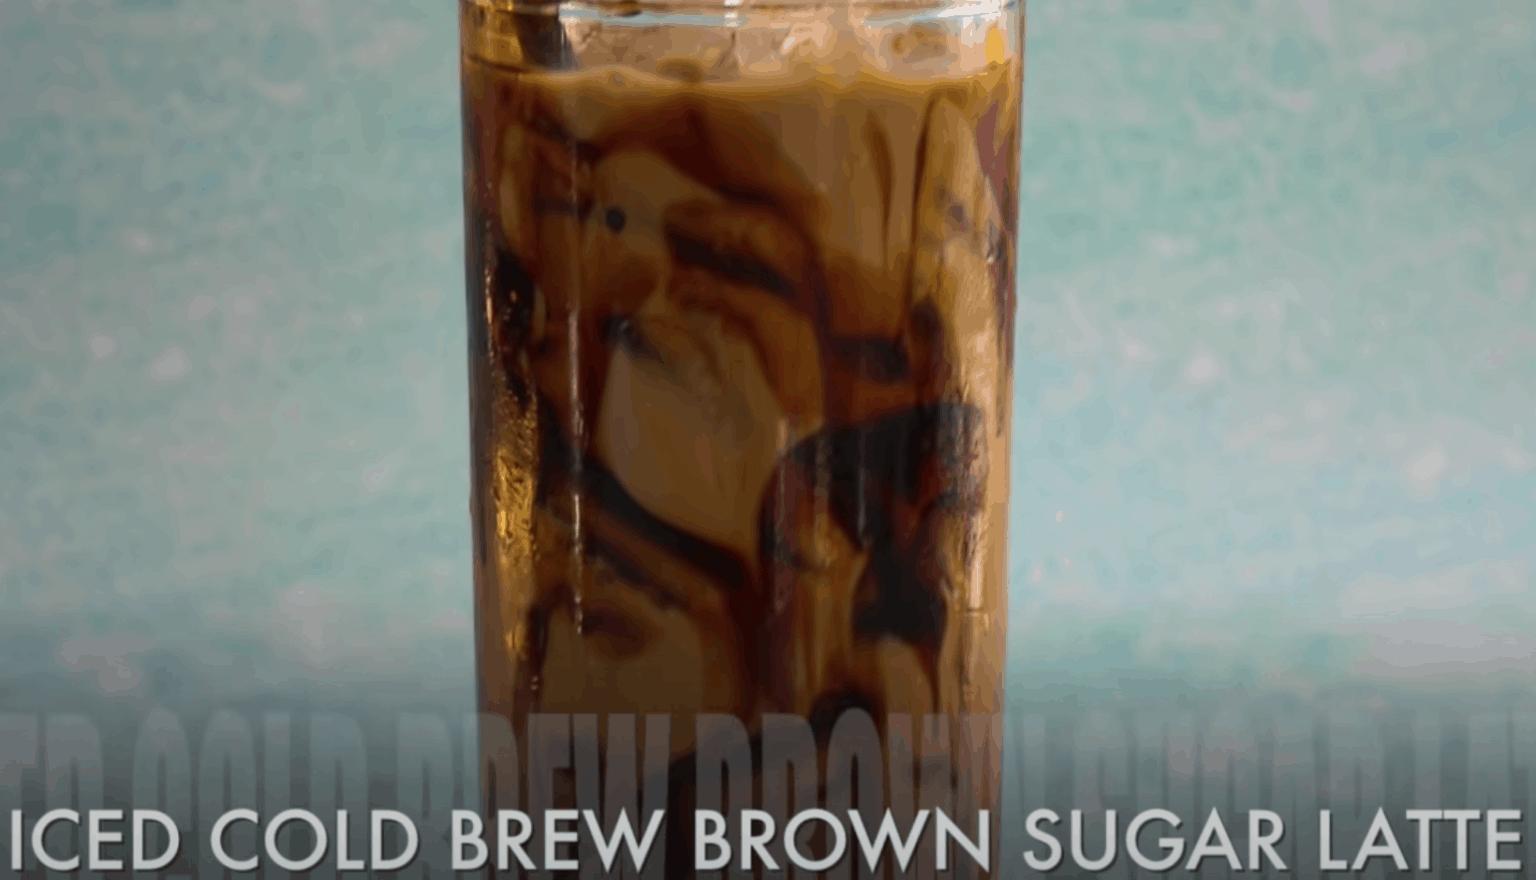 Iced Cold Brew Brown Sugar Latte